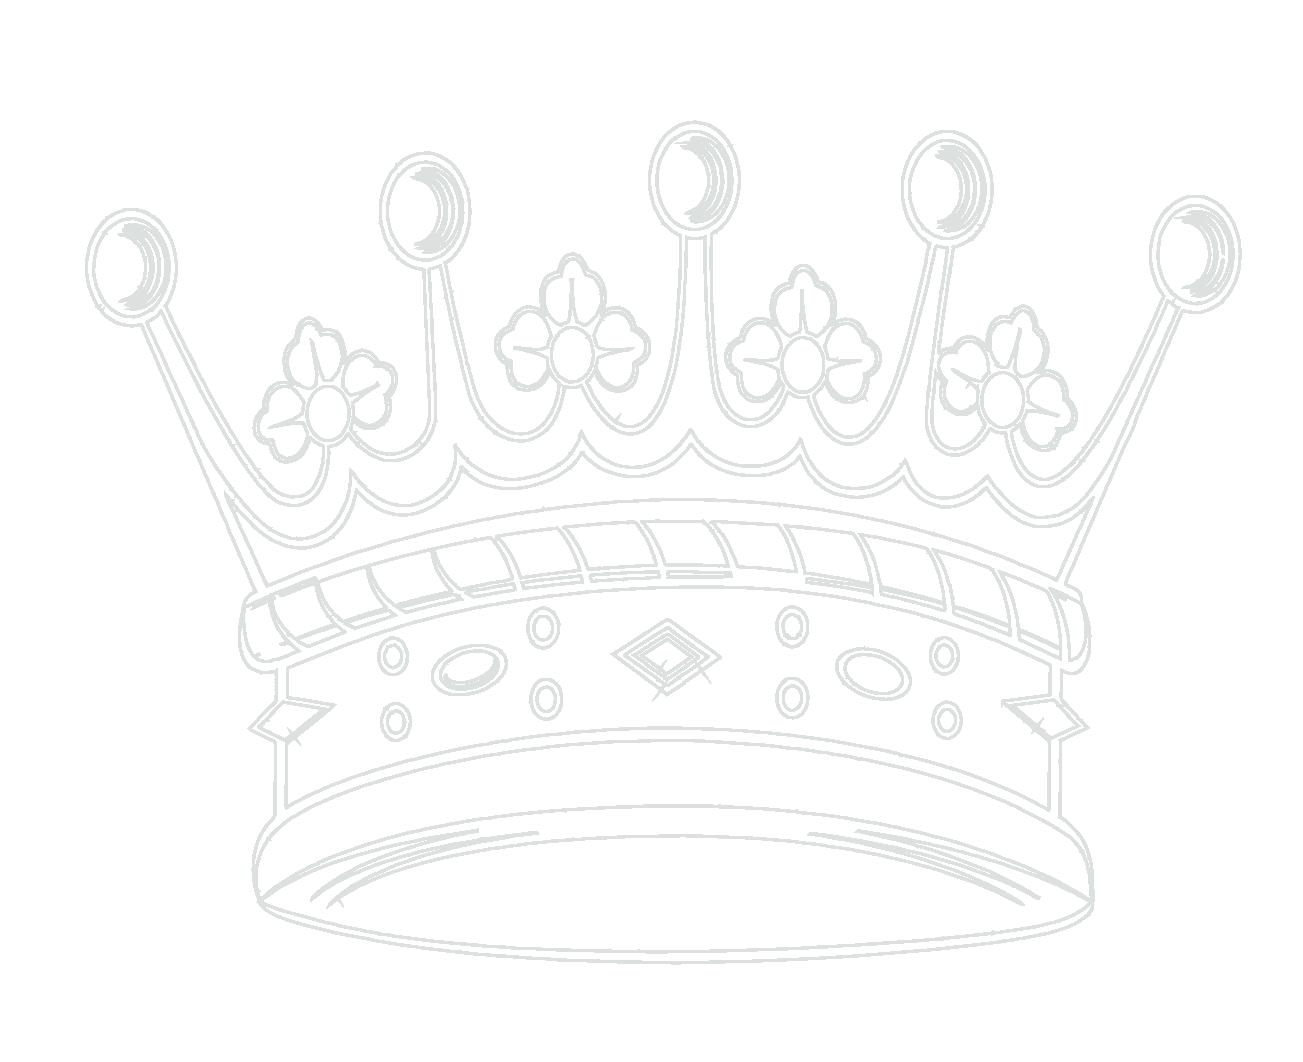 King Dance